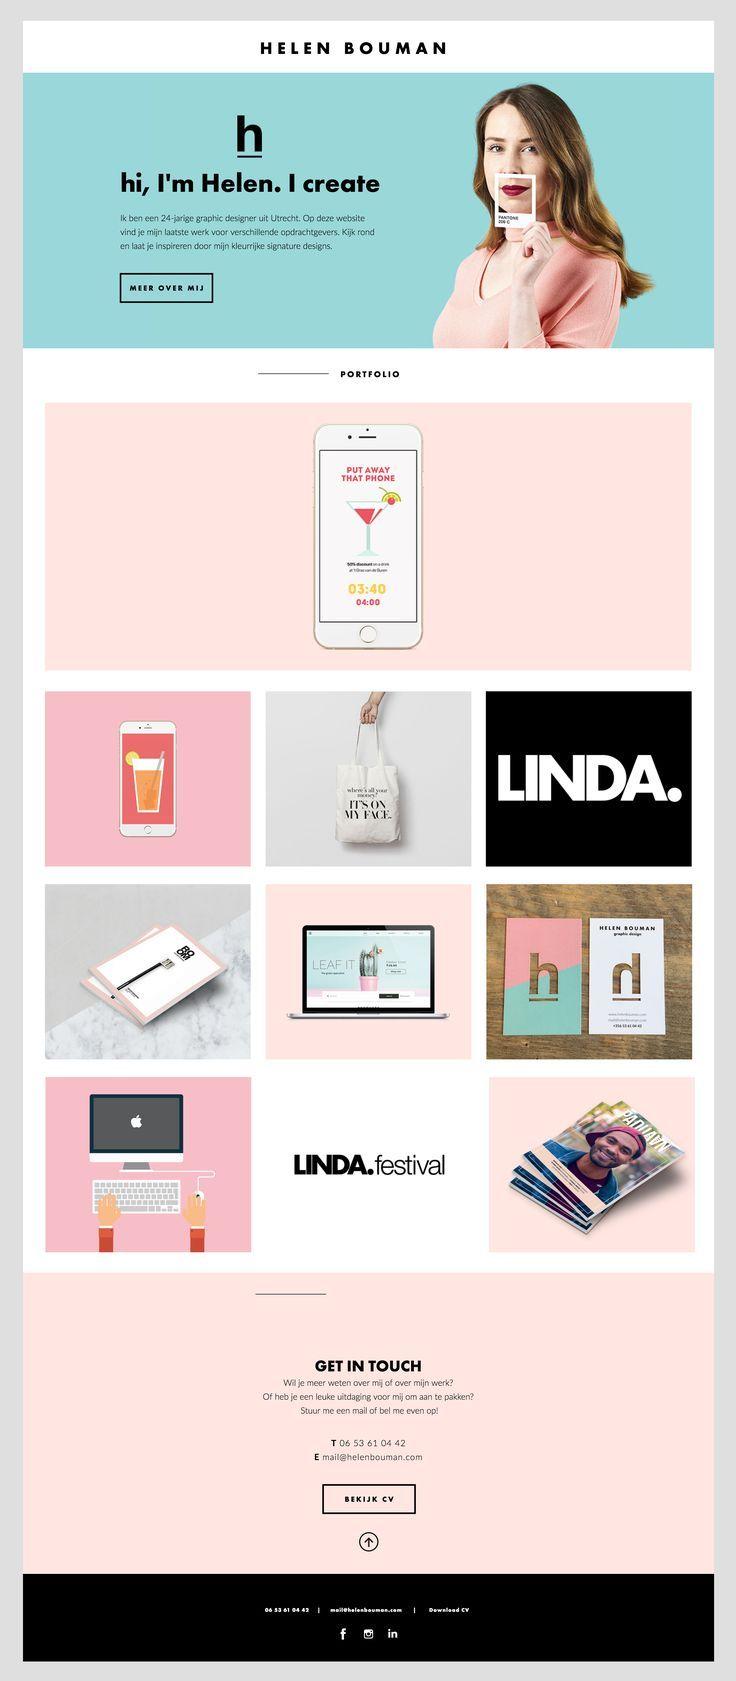 Simple But Creative Portfolio Website Design For Graphic Designer Creative Design Desi Portfolio Website Design Portfolio Web Design Website Design Layout